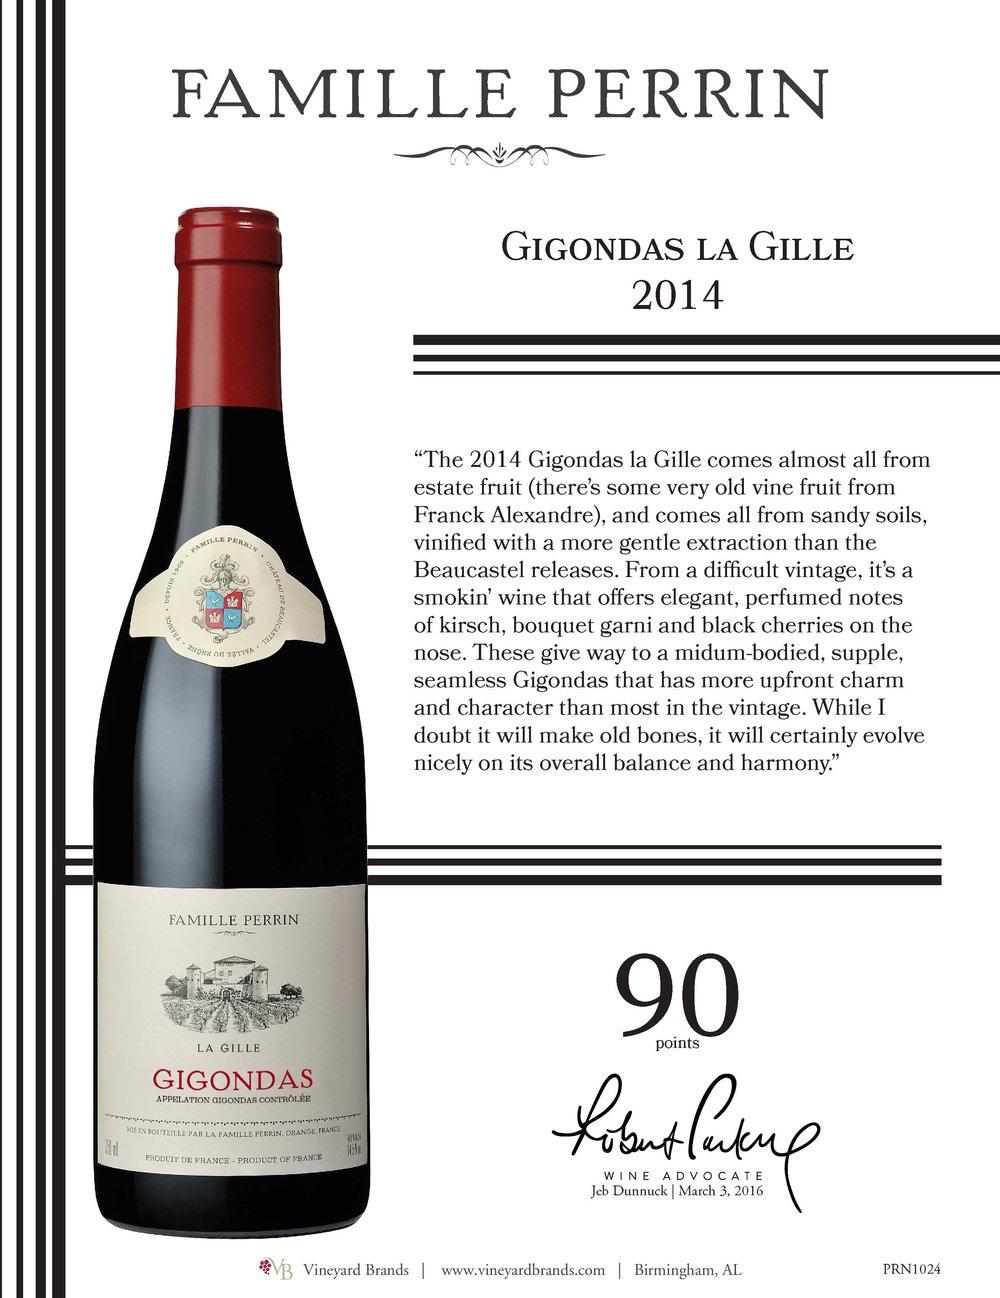 Famille Perrin Gigondas La Gille 2014.jpg